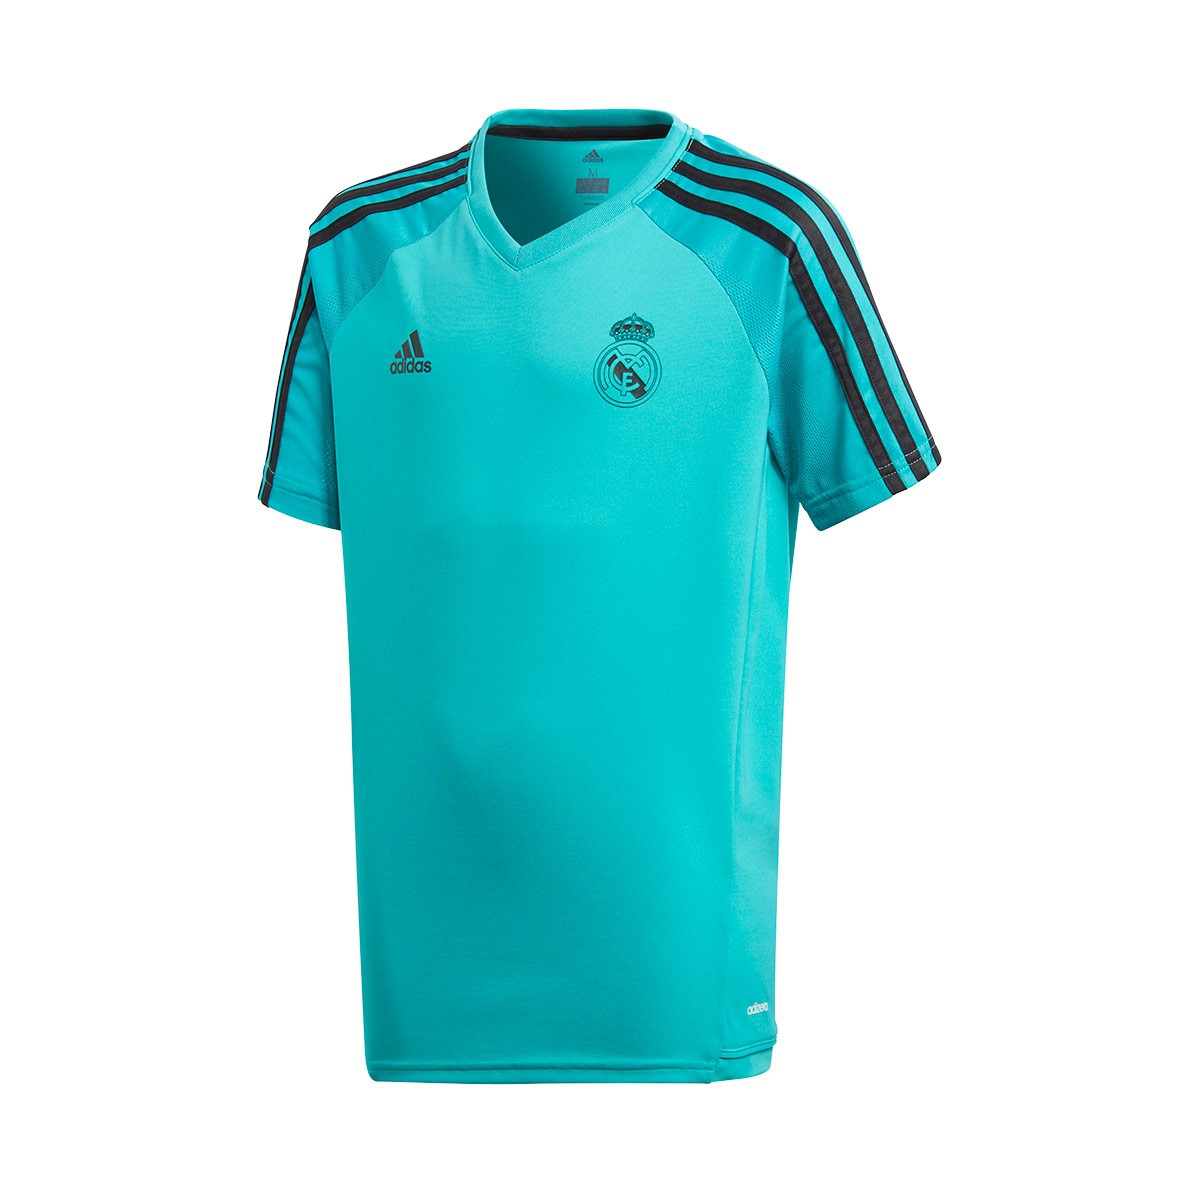 Jersey adidas Kids Real Madrid Training 2017-2018 Aero reef ... d77f76d3af5d7